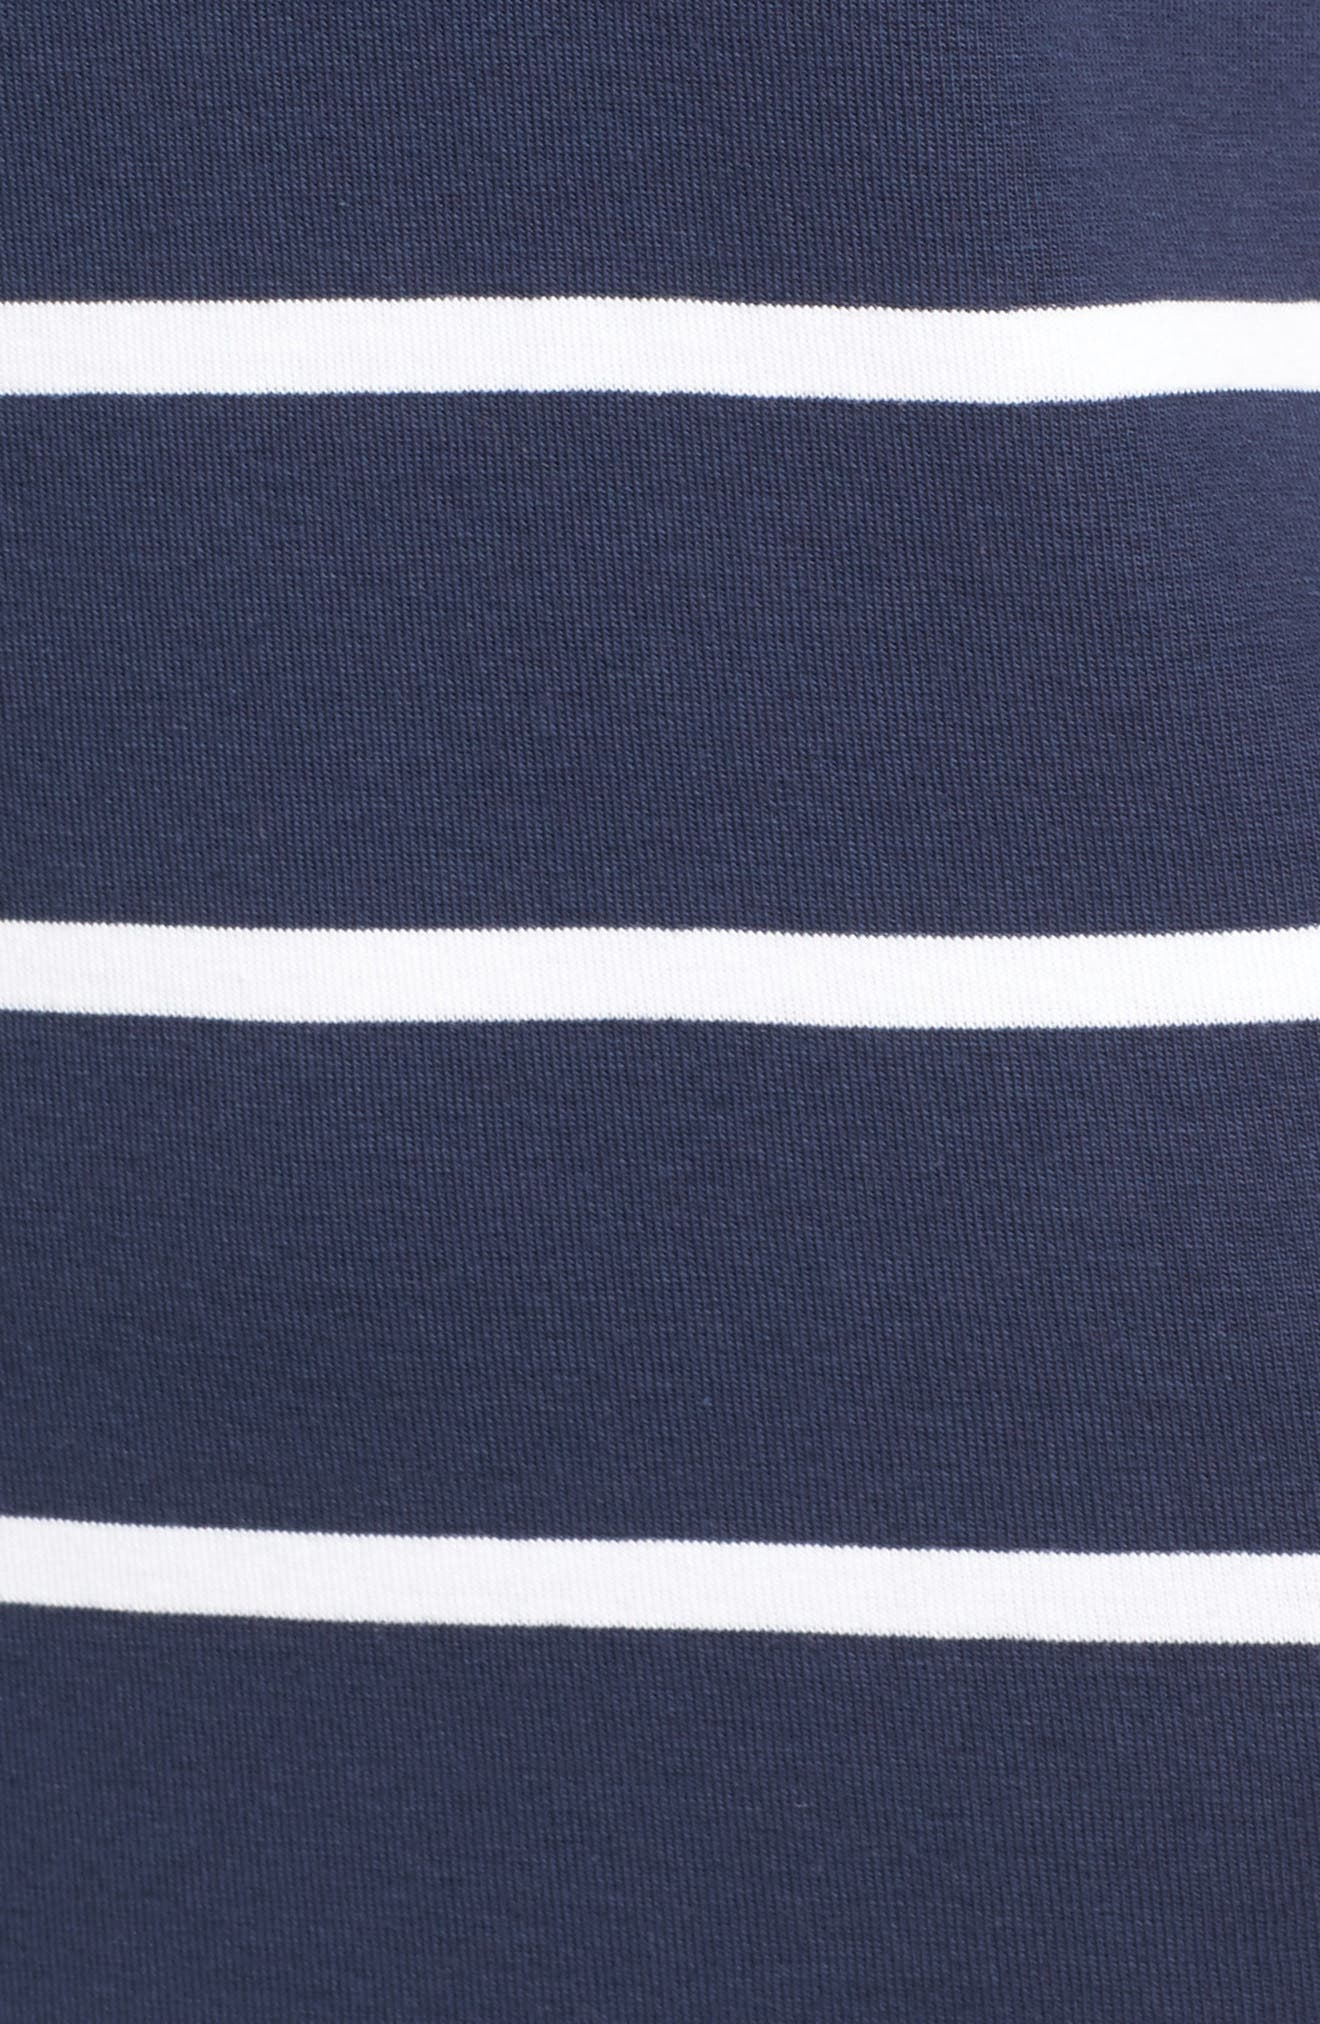 Blakeney T-Shirt Dress,                             Alternate thumbnail 5, color,